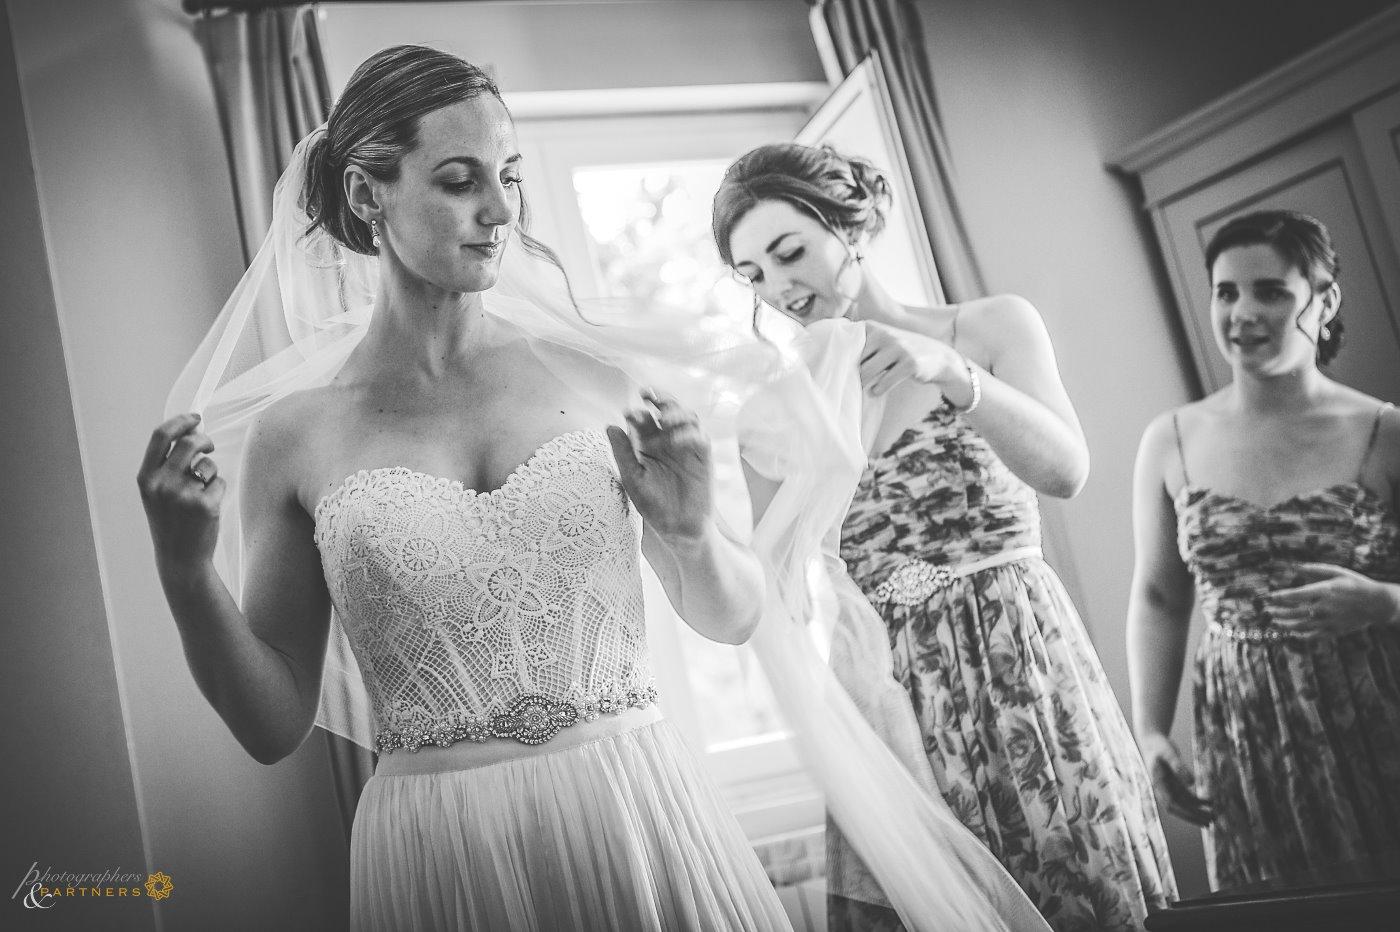 photography_weddings_bagni_lucca_03.jpg